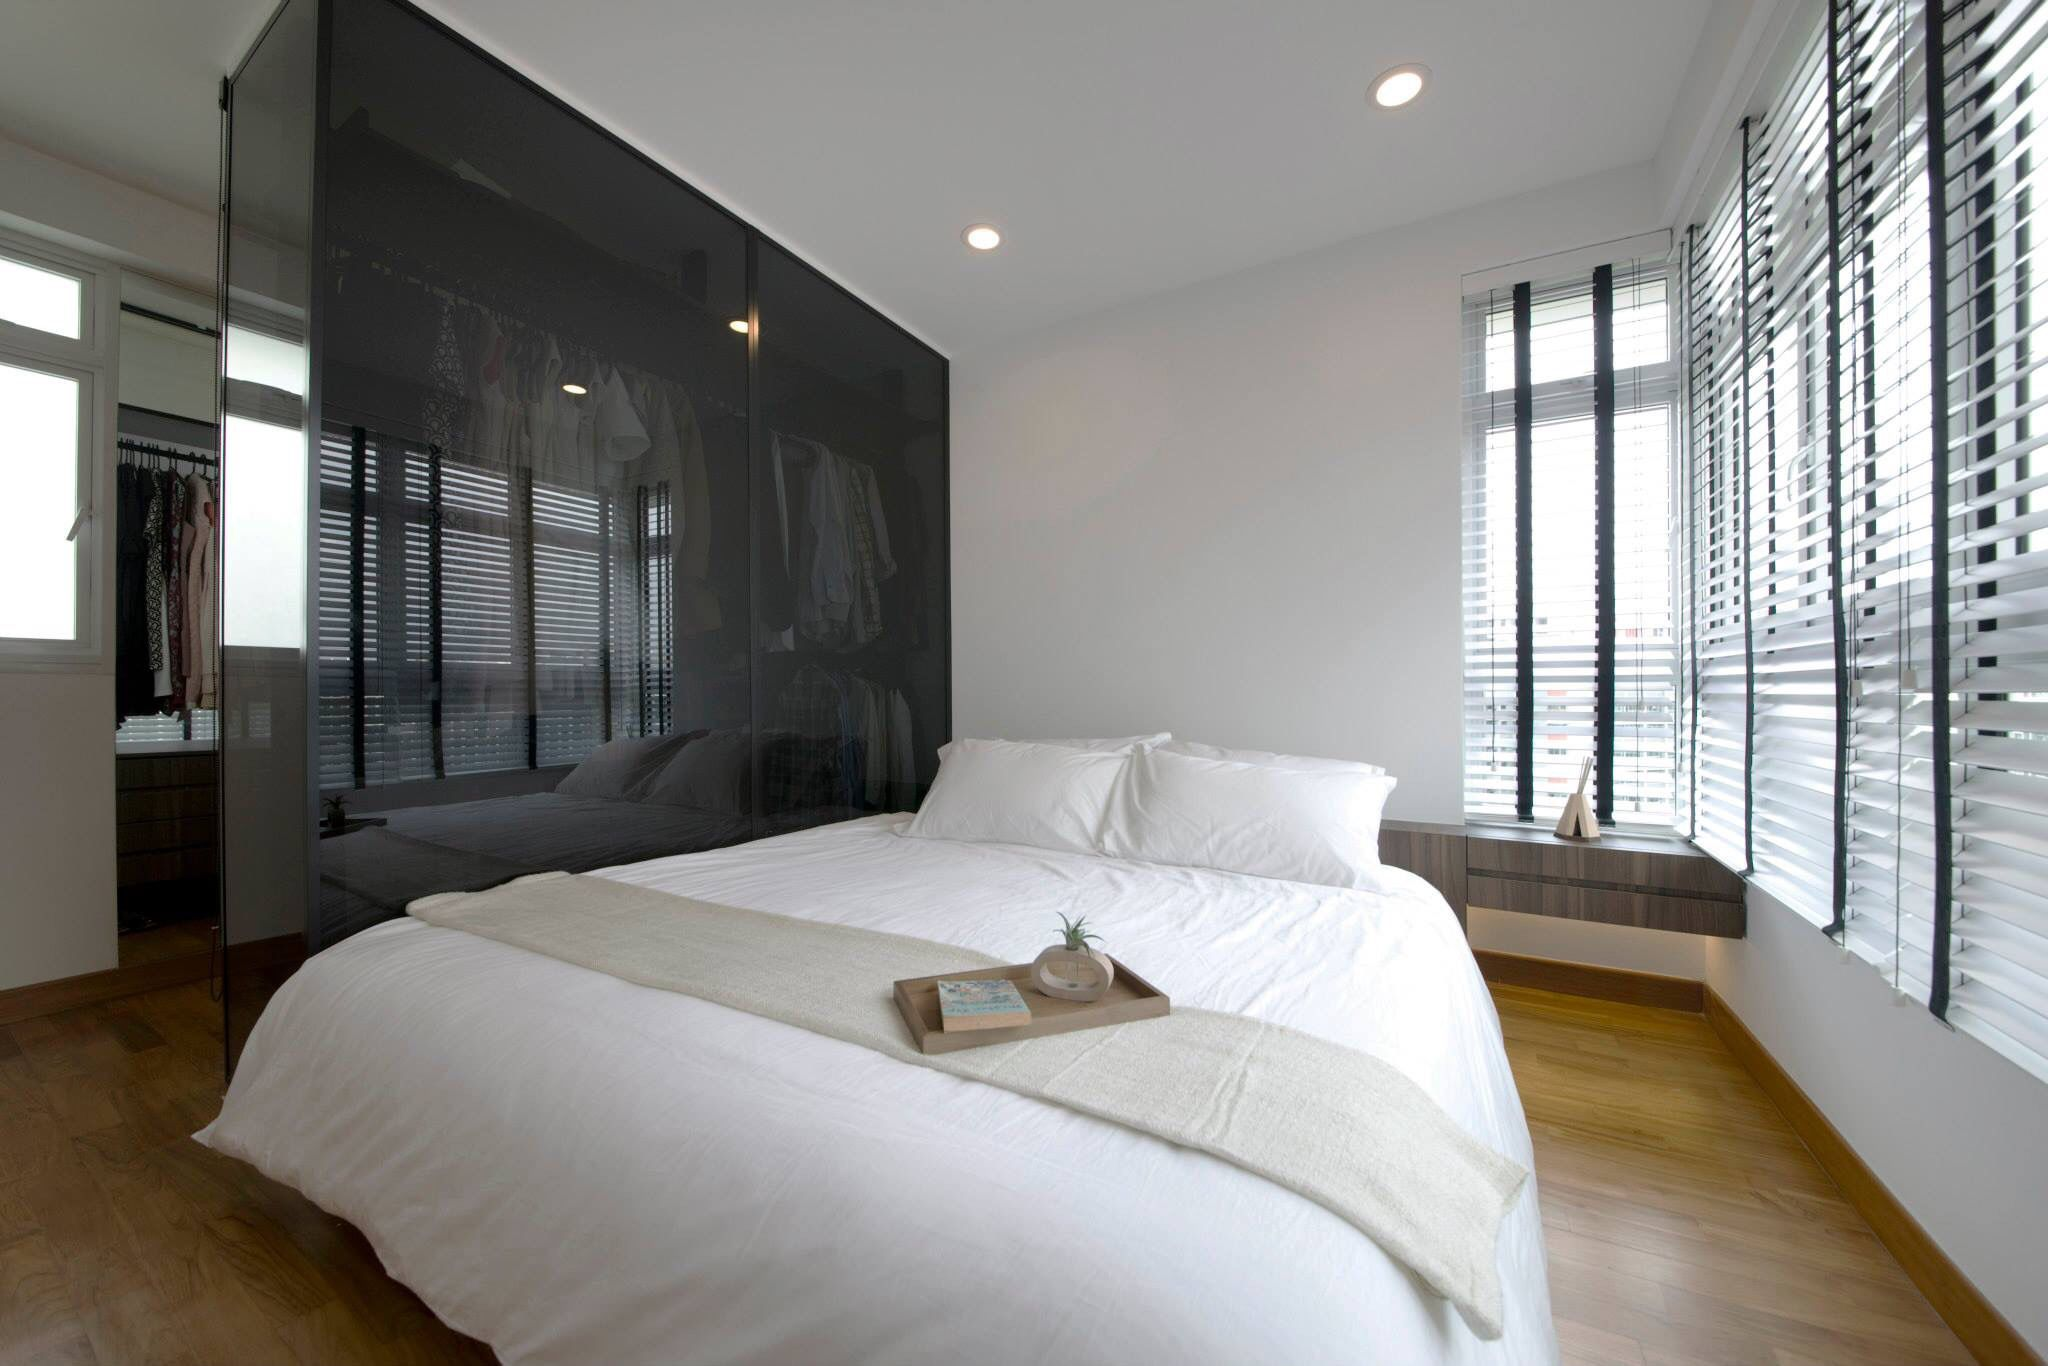 Master Bedroom View With Walk In Wardrobe Wardrobe Design Bedroom Modern Bedroom Master Bedroom Design